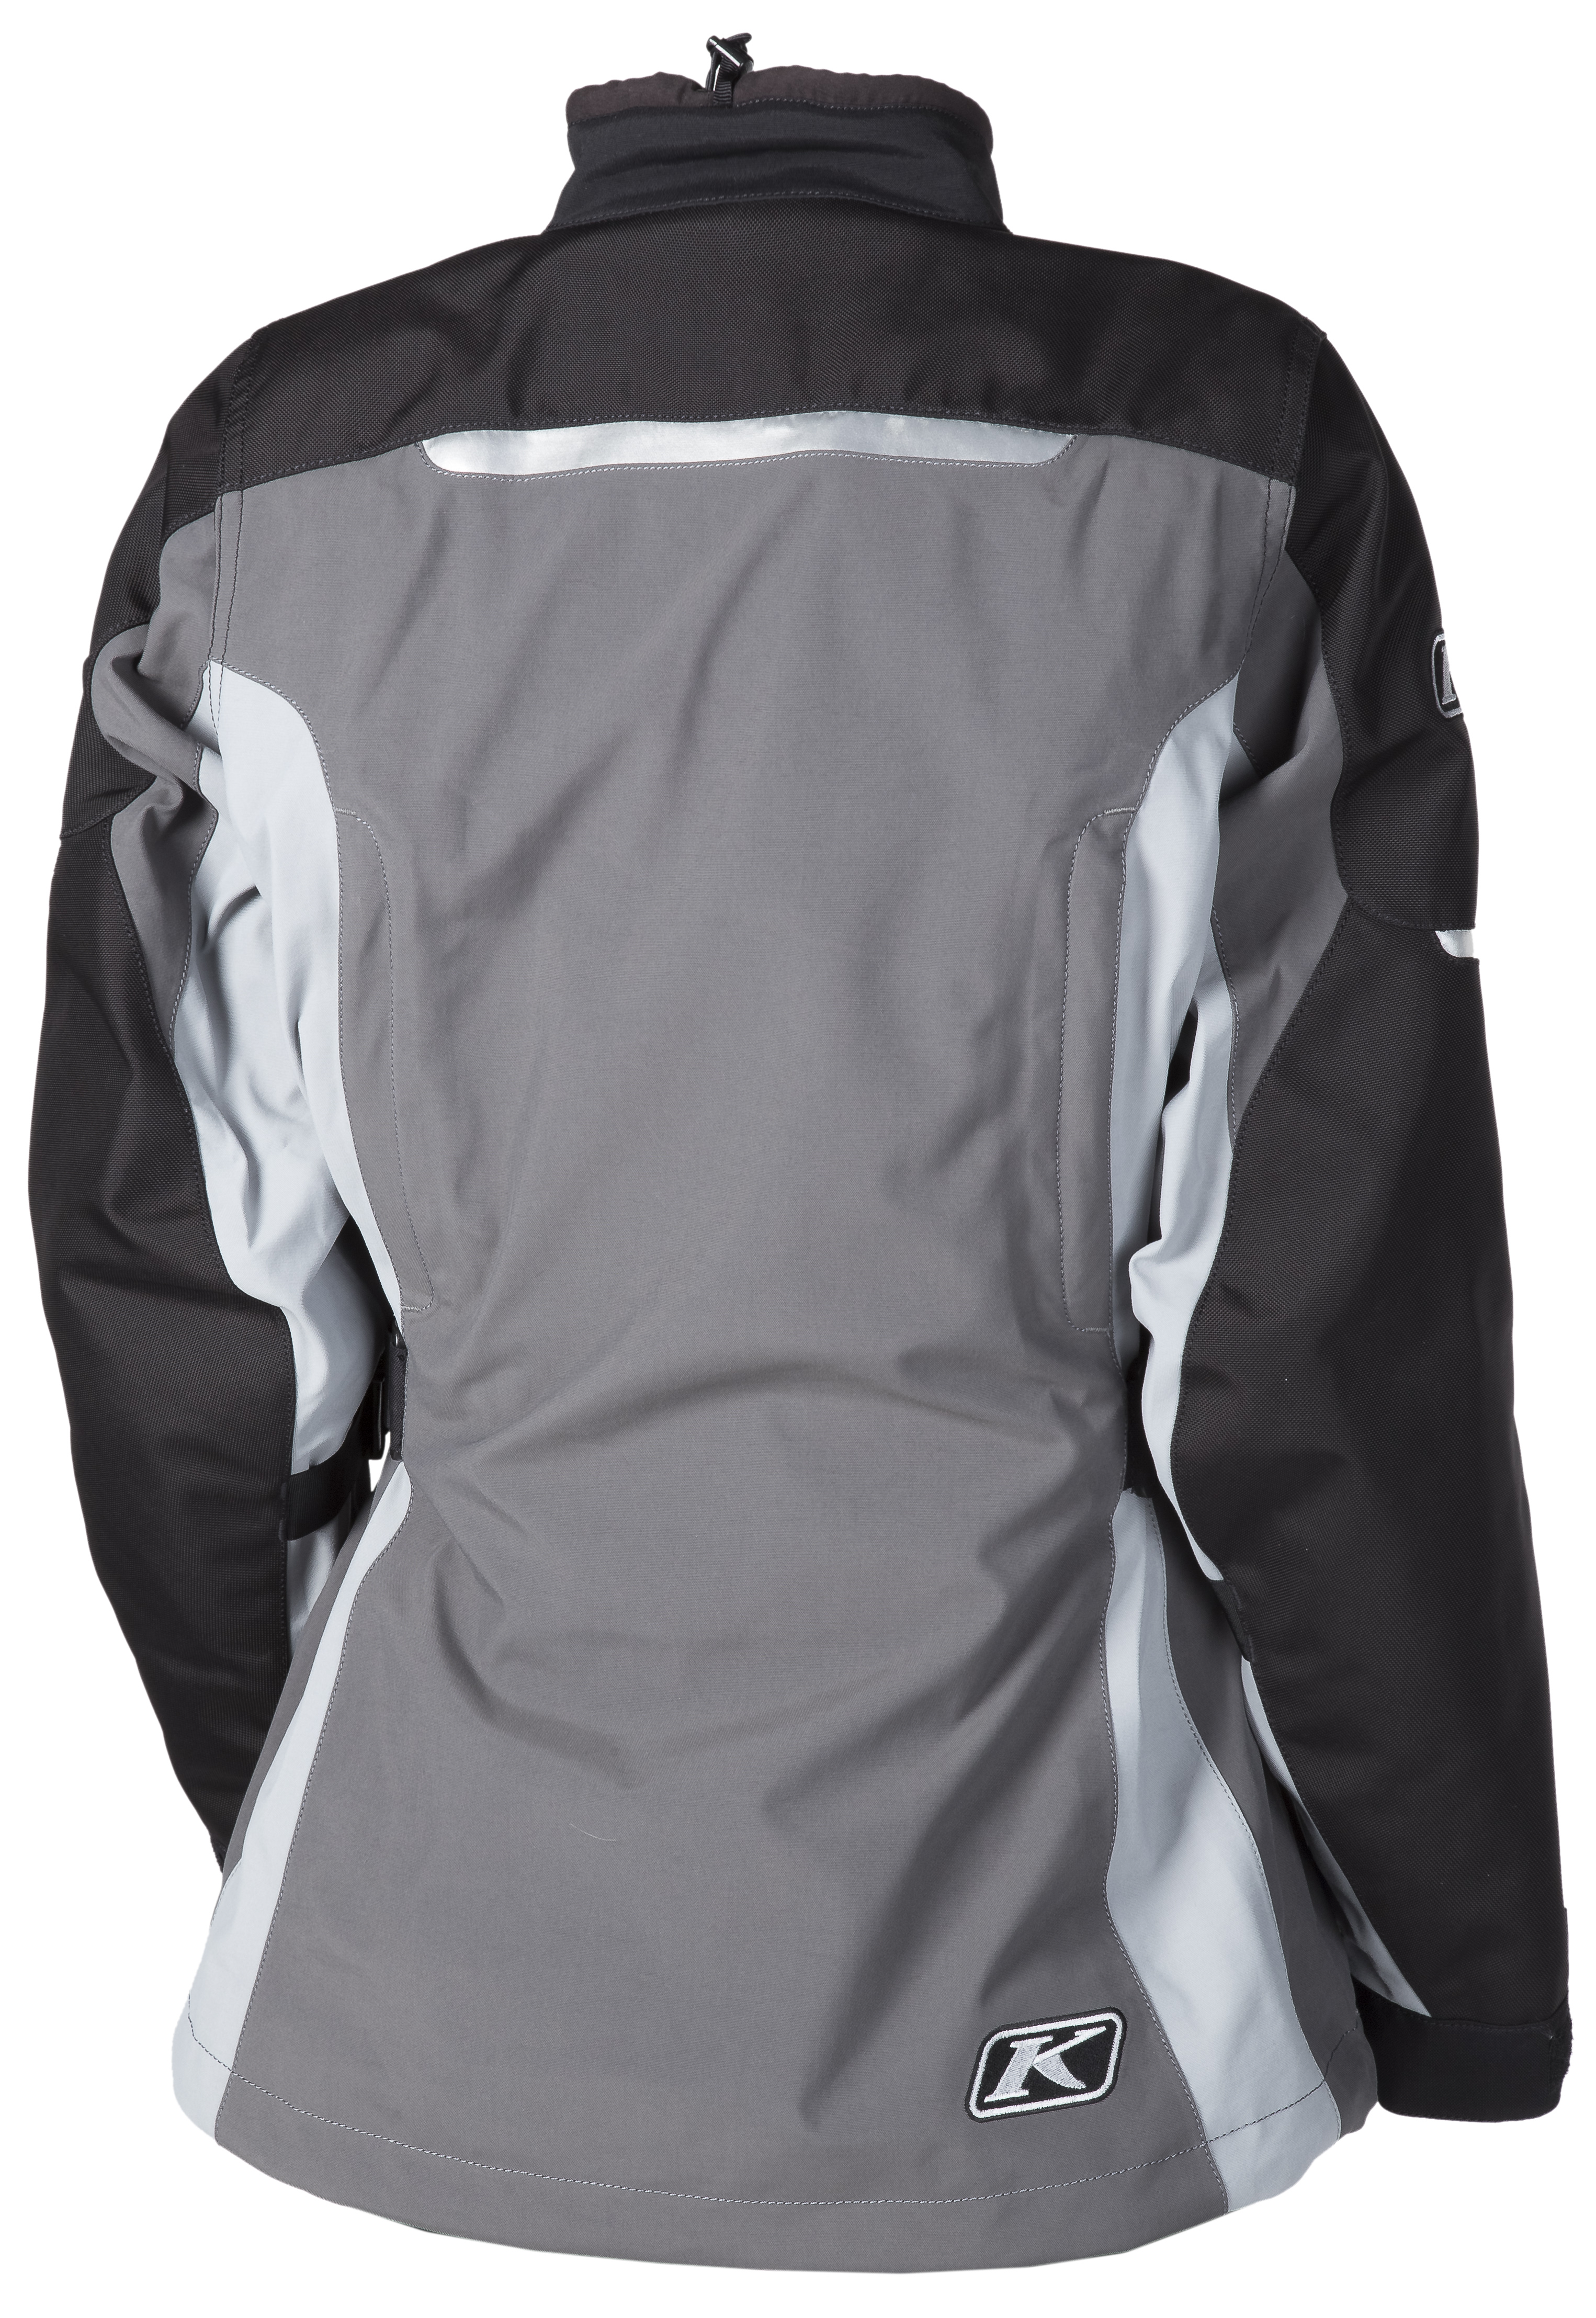 5093-001-600 Altitude Jacket D1